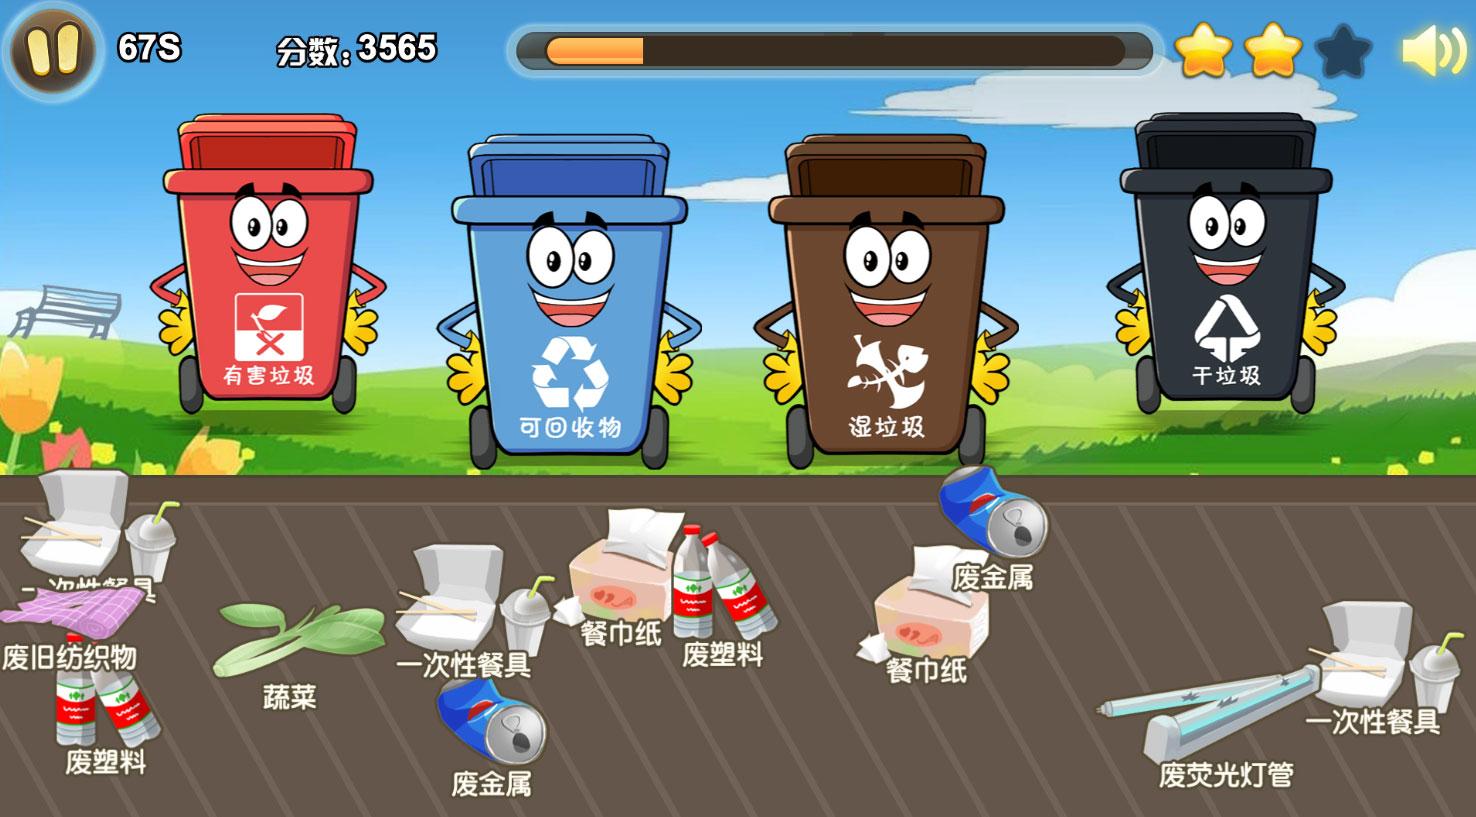 Screen grab from Garbage Sorting game